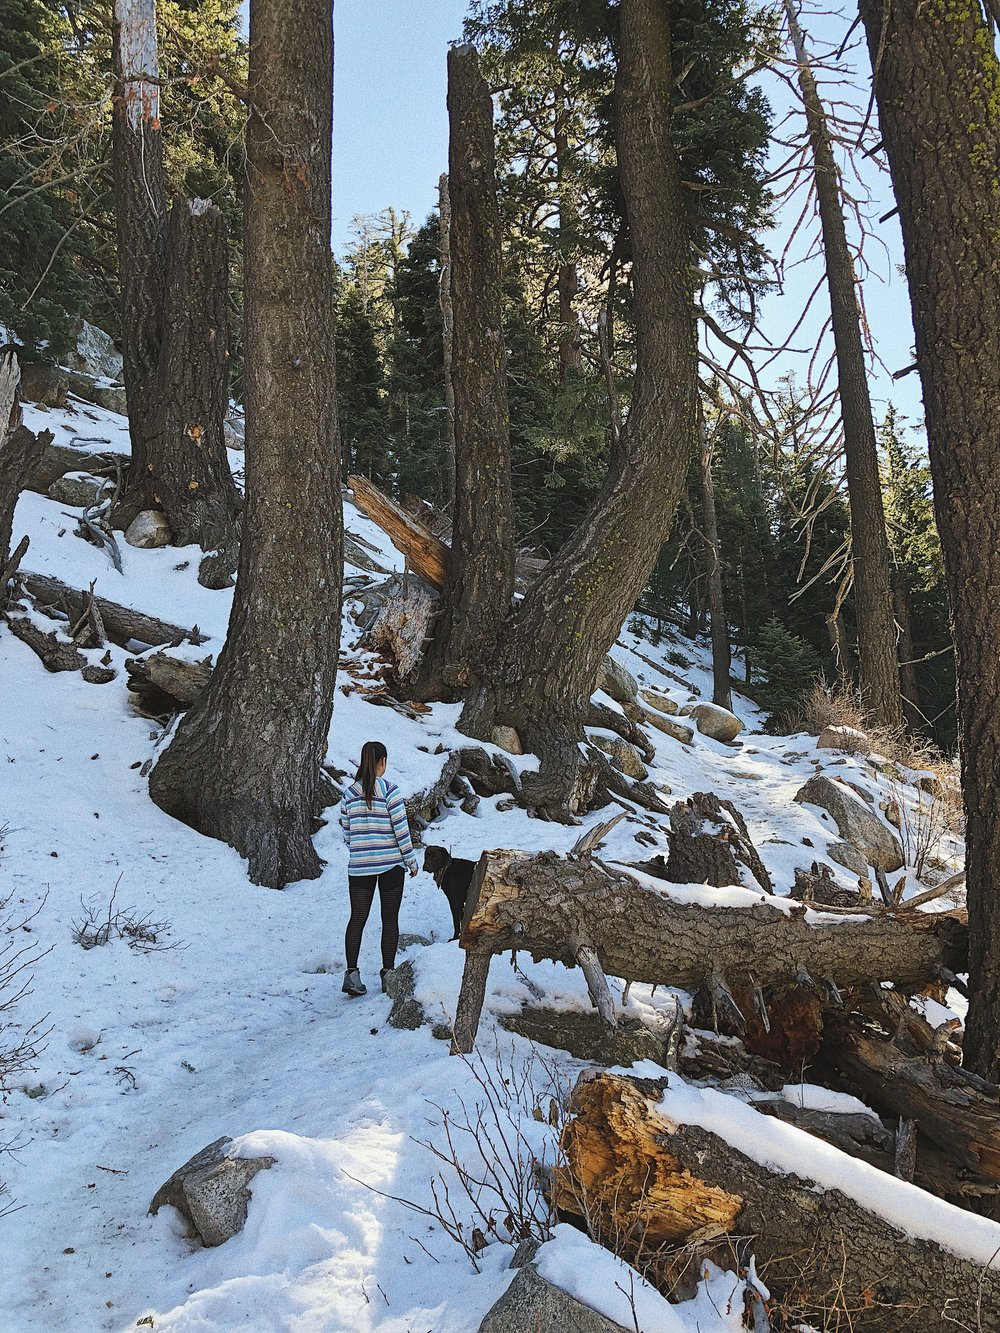 Tahquitz Peak via Devils Slide Trail